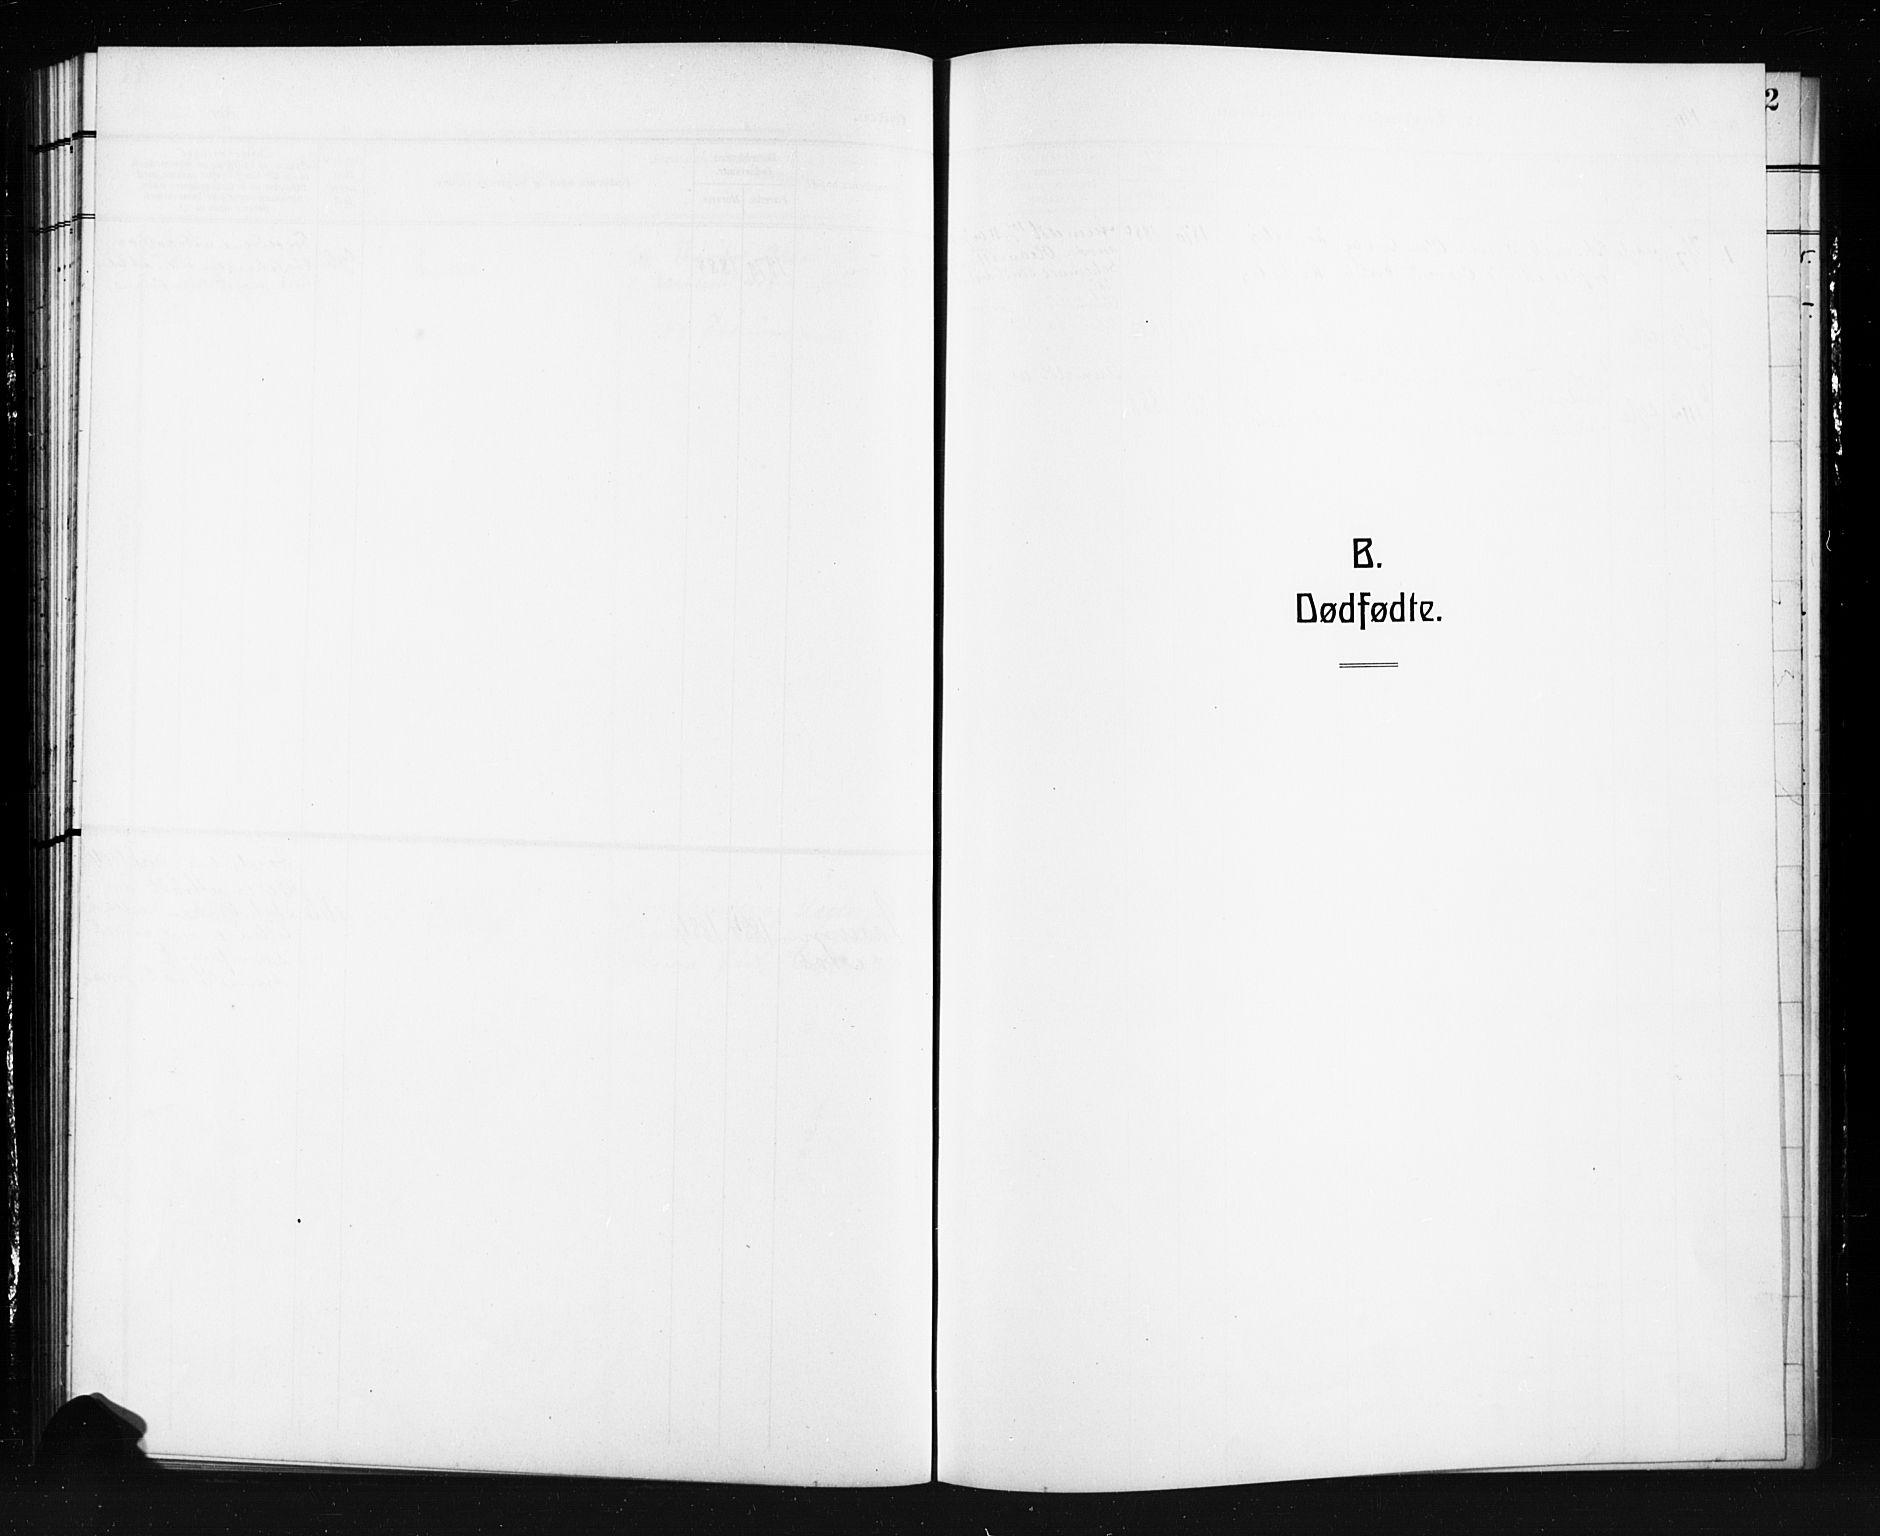 SAO, Trøgstad prestekontor Kirkebøker, G/Gb/L0001: Klokkerbok nr. II 1, 1911-1925